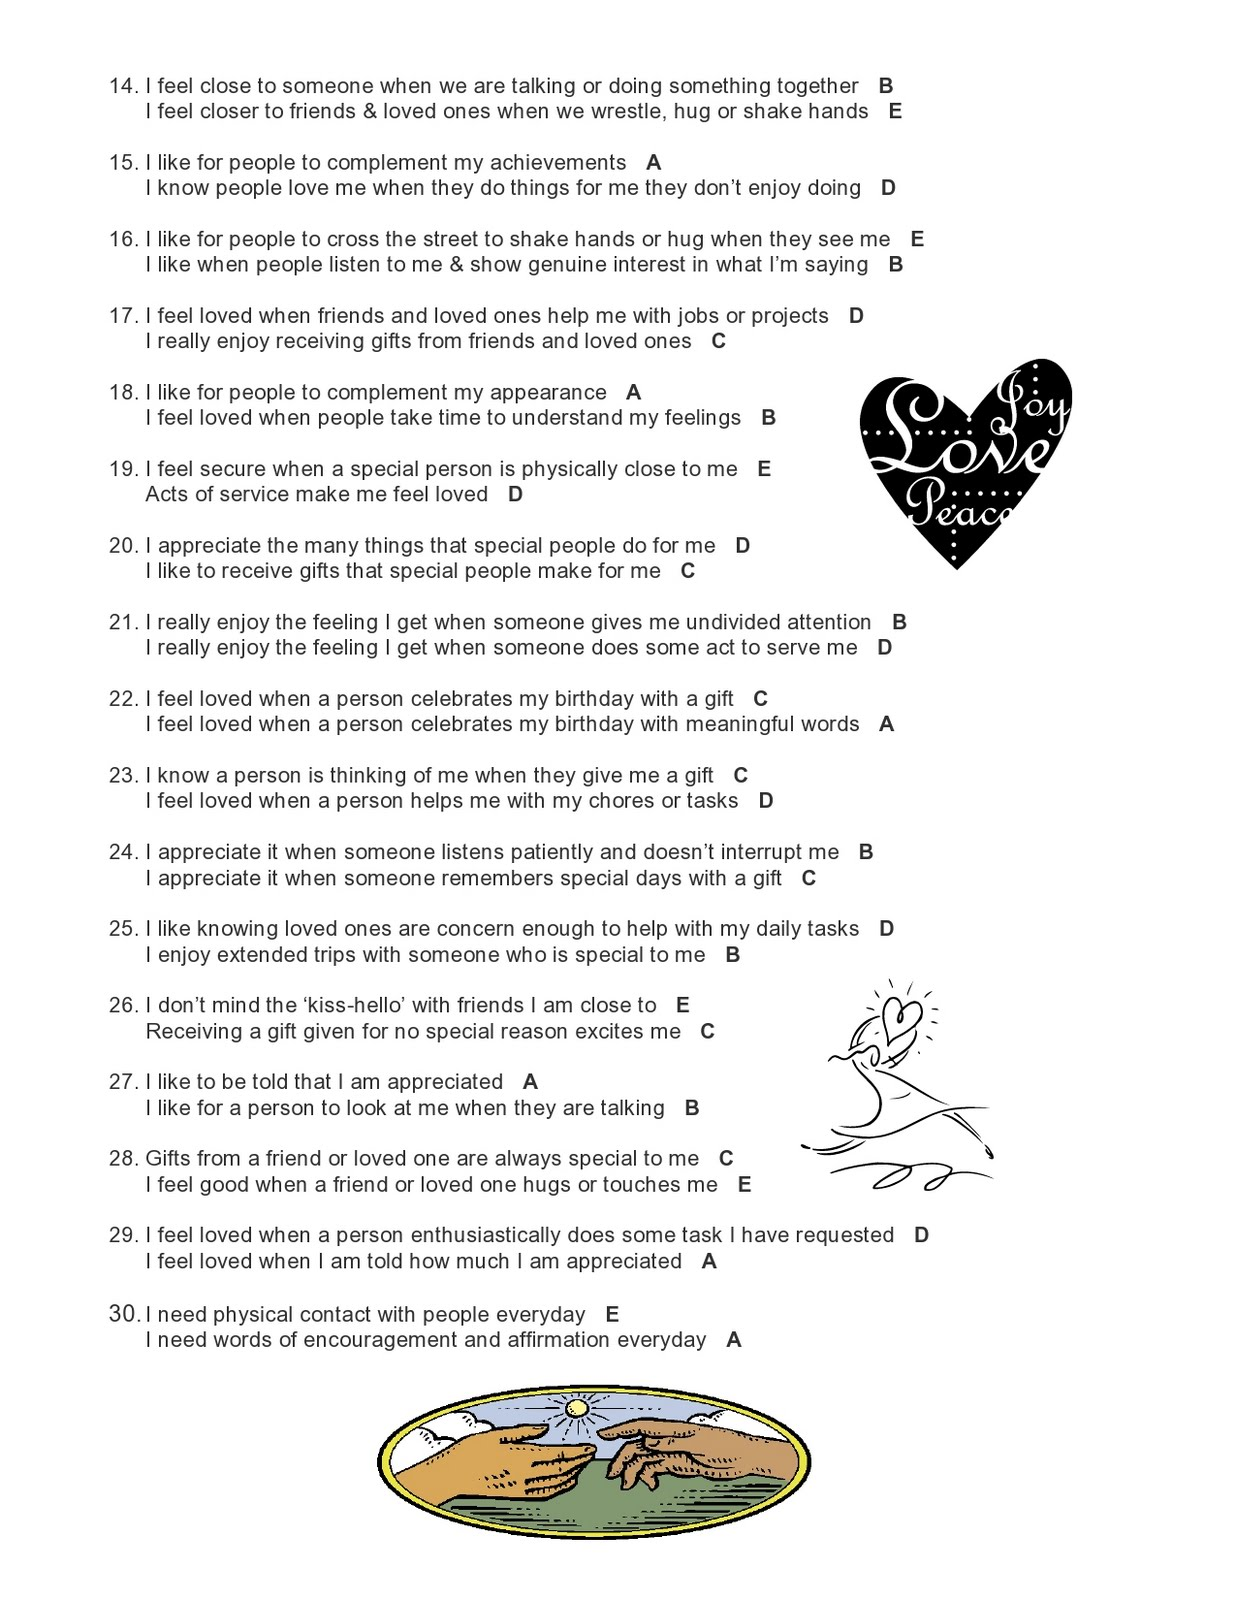 Know Your Scientist Worksheet